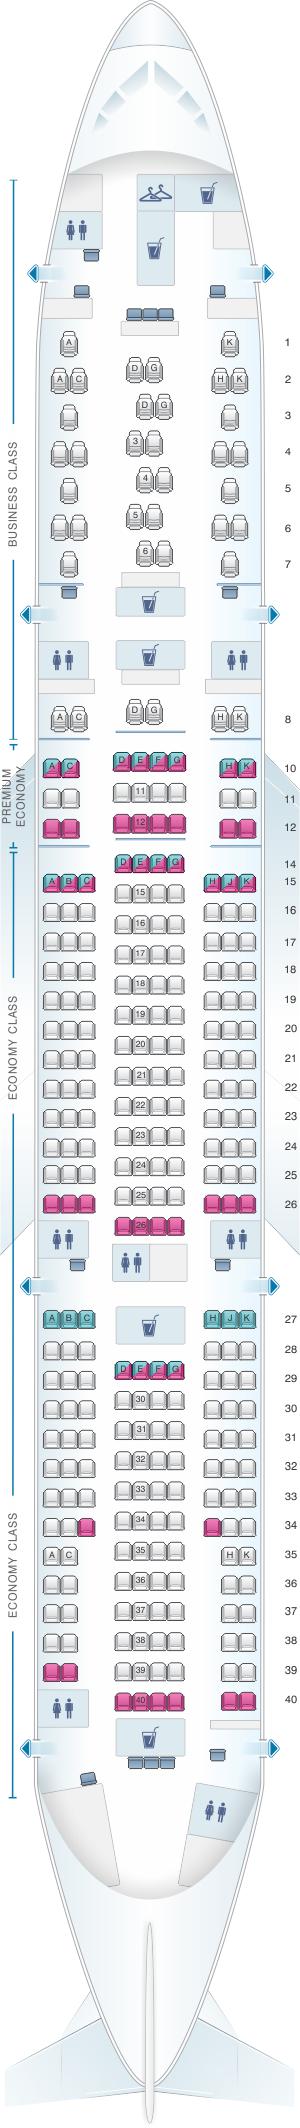 Seat map for Austrian Airlines Boeing B777 200ER V2